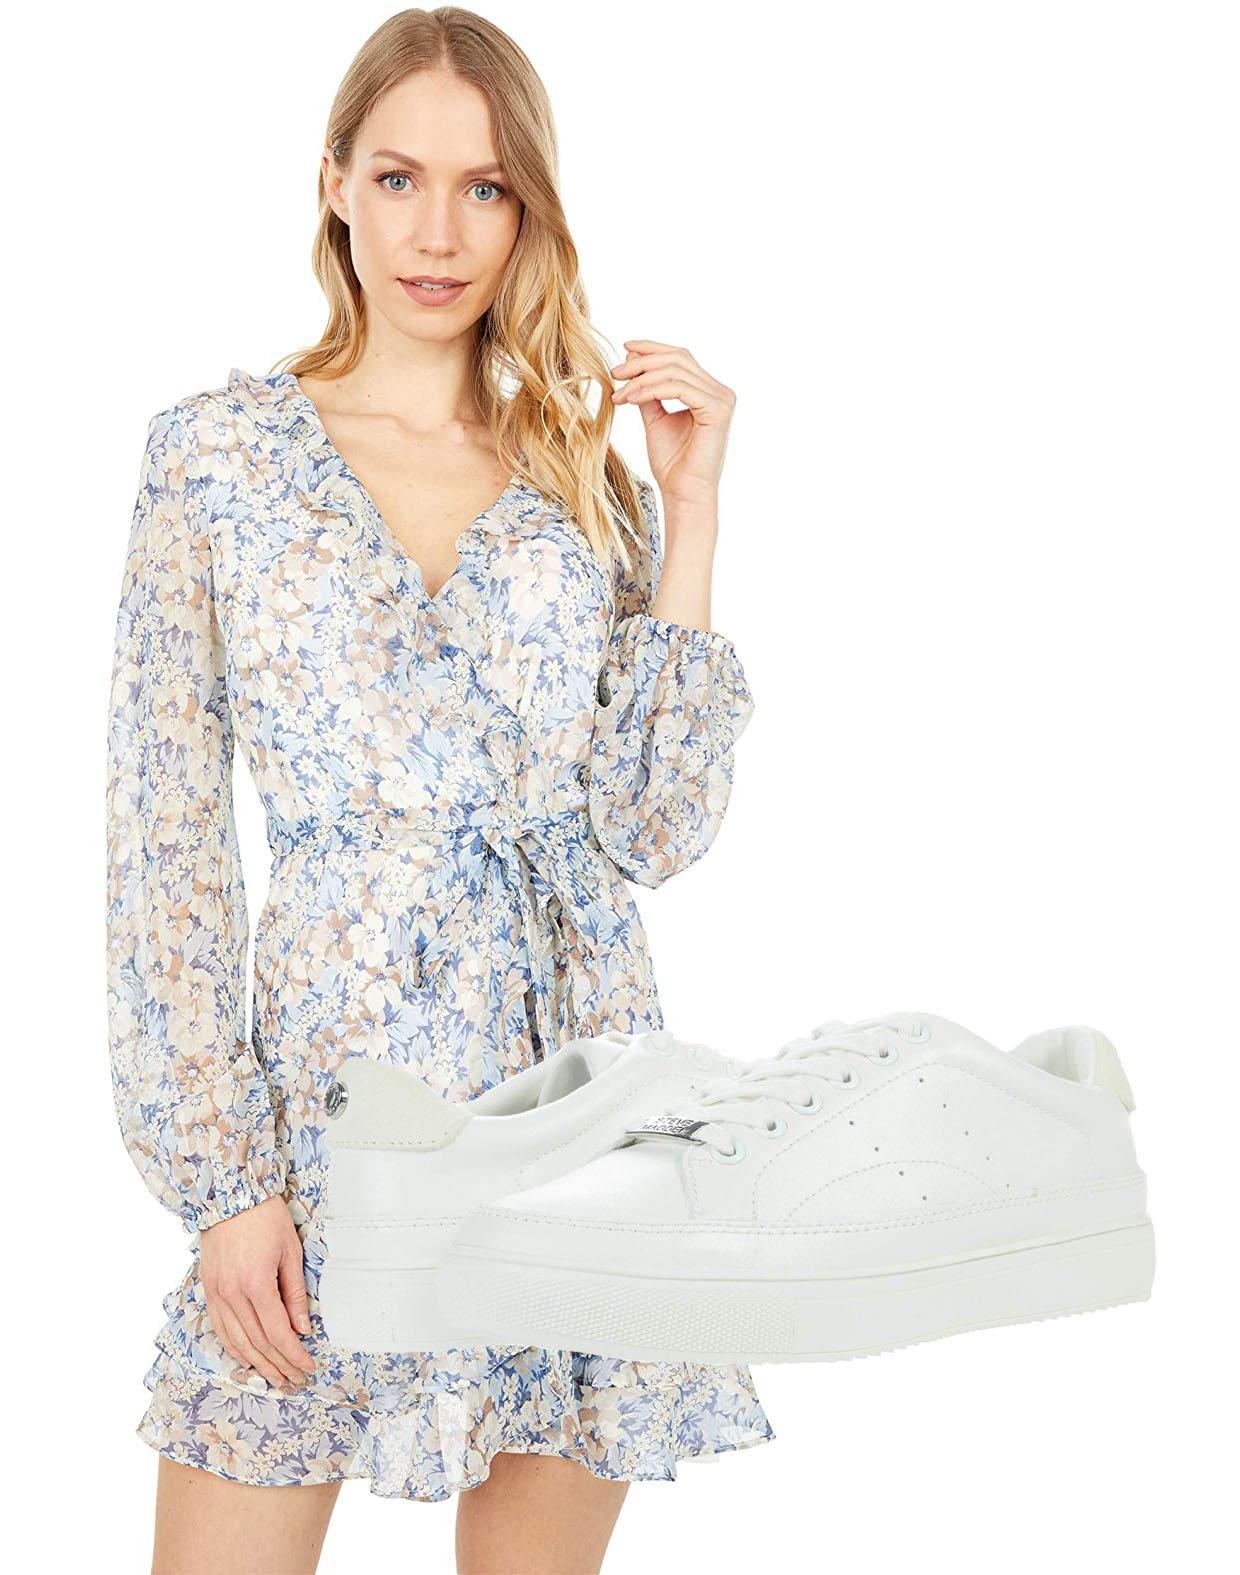 Bardot Triple Frill Floral Dress, Steve Madden Bleachers Sneakers